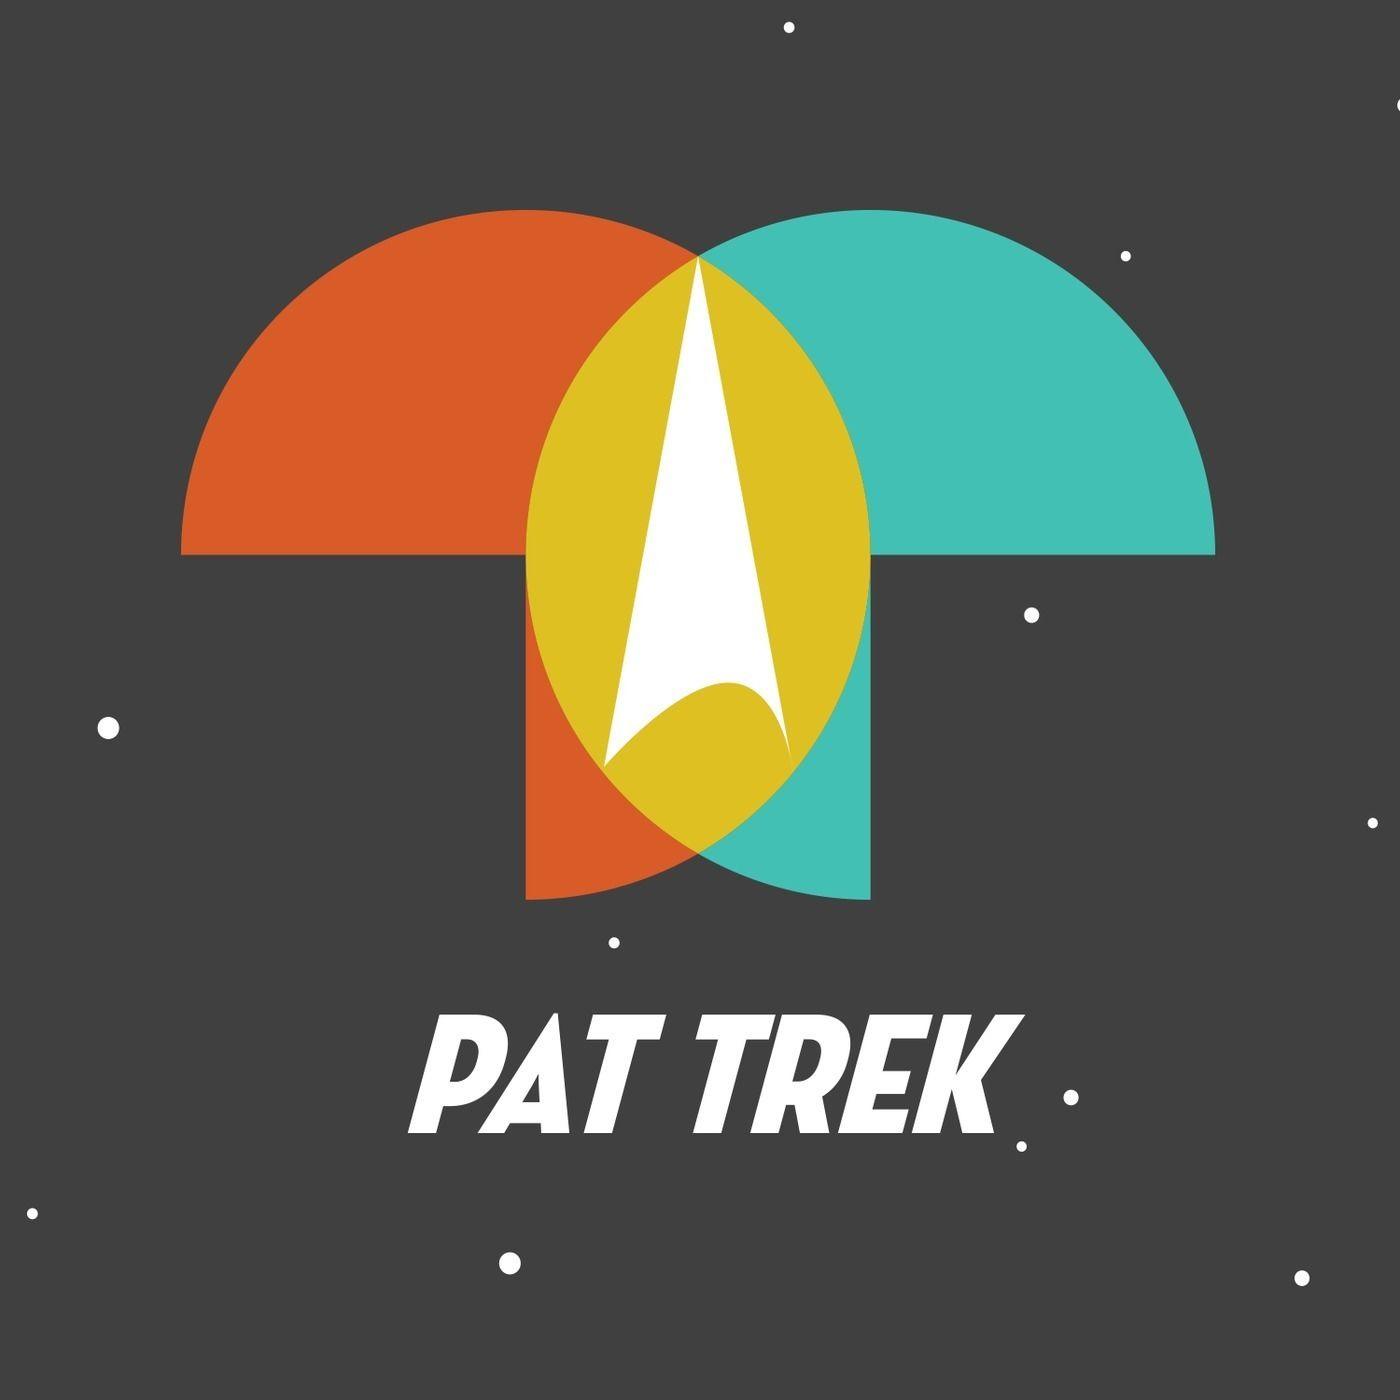 Pat Trek